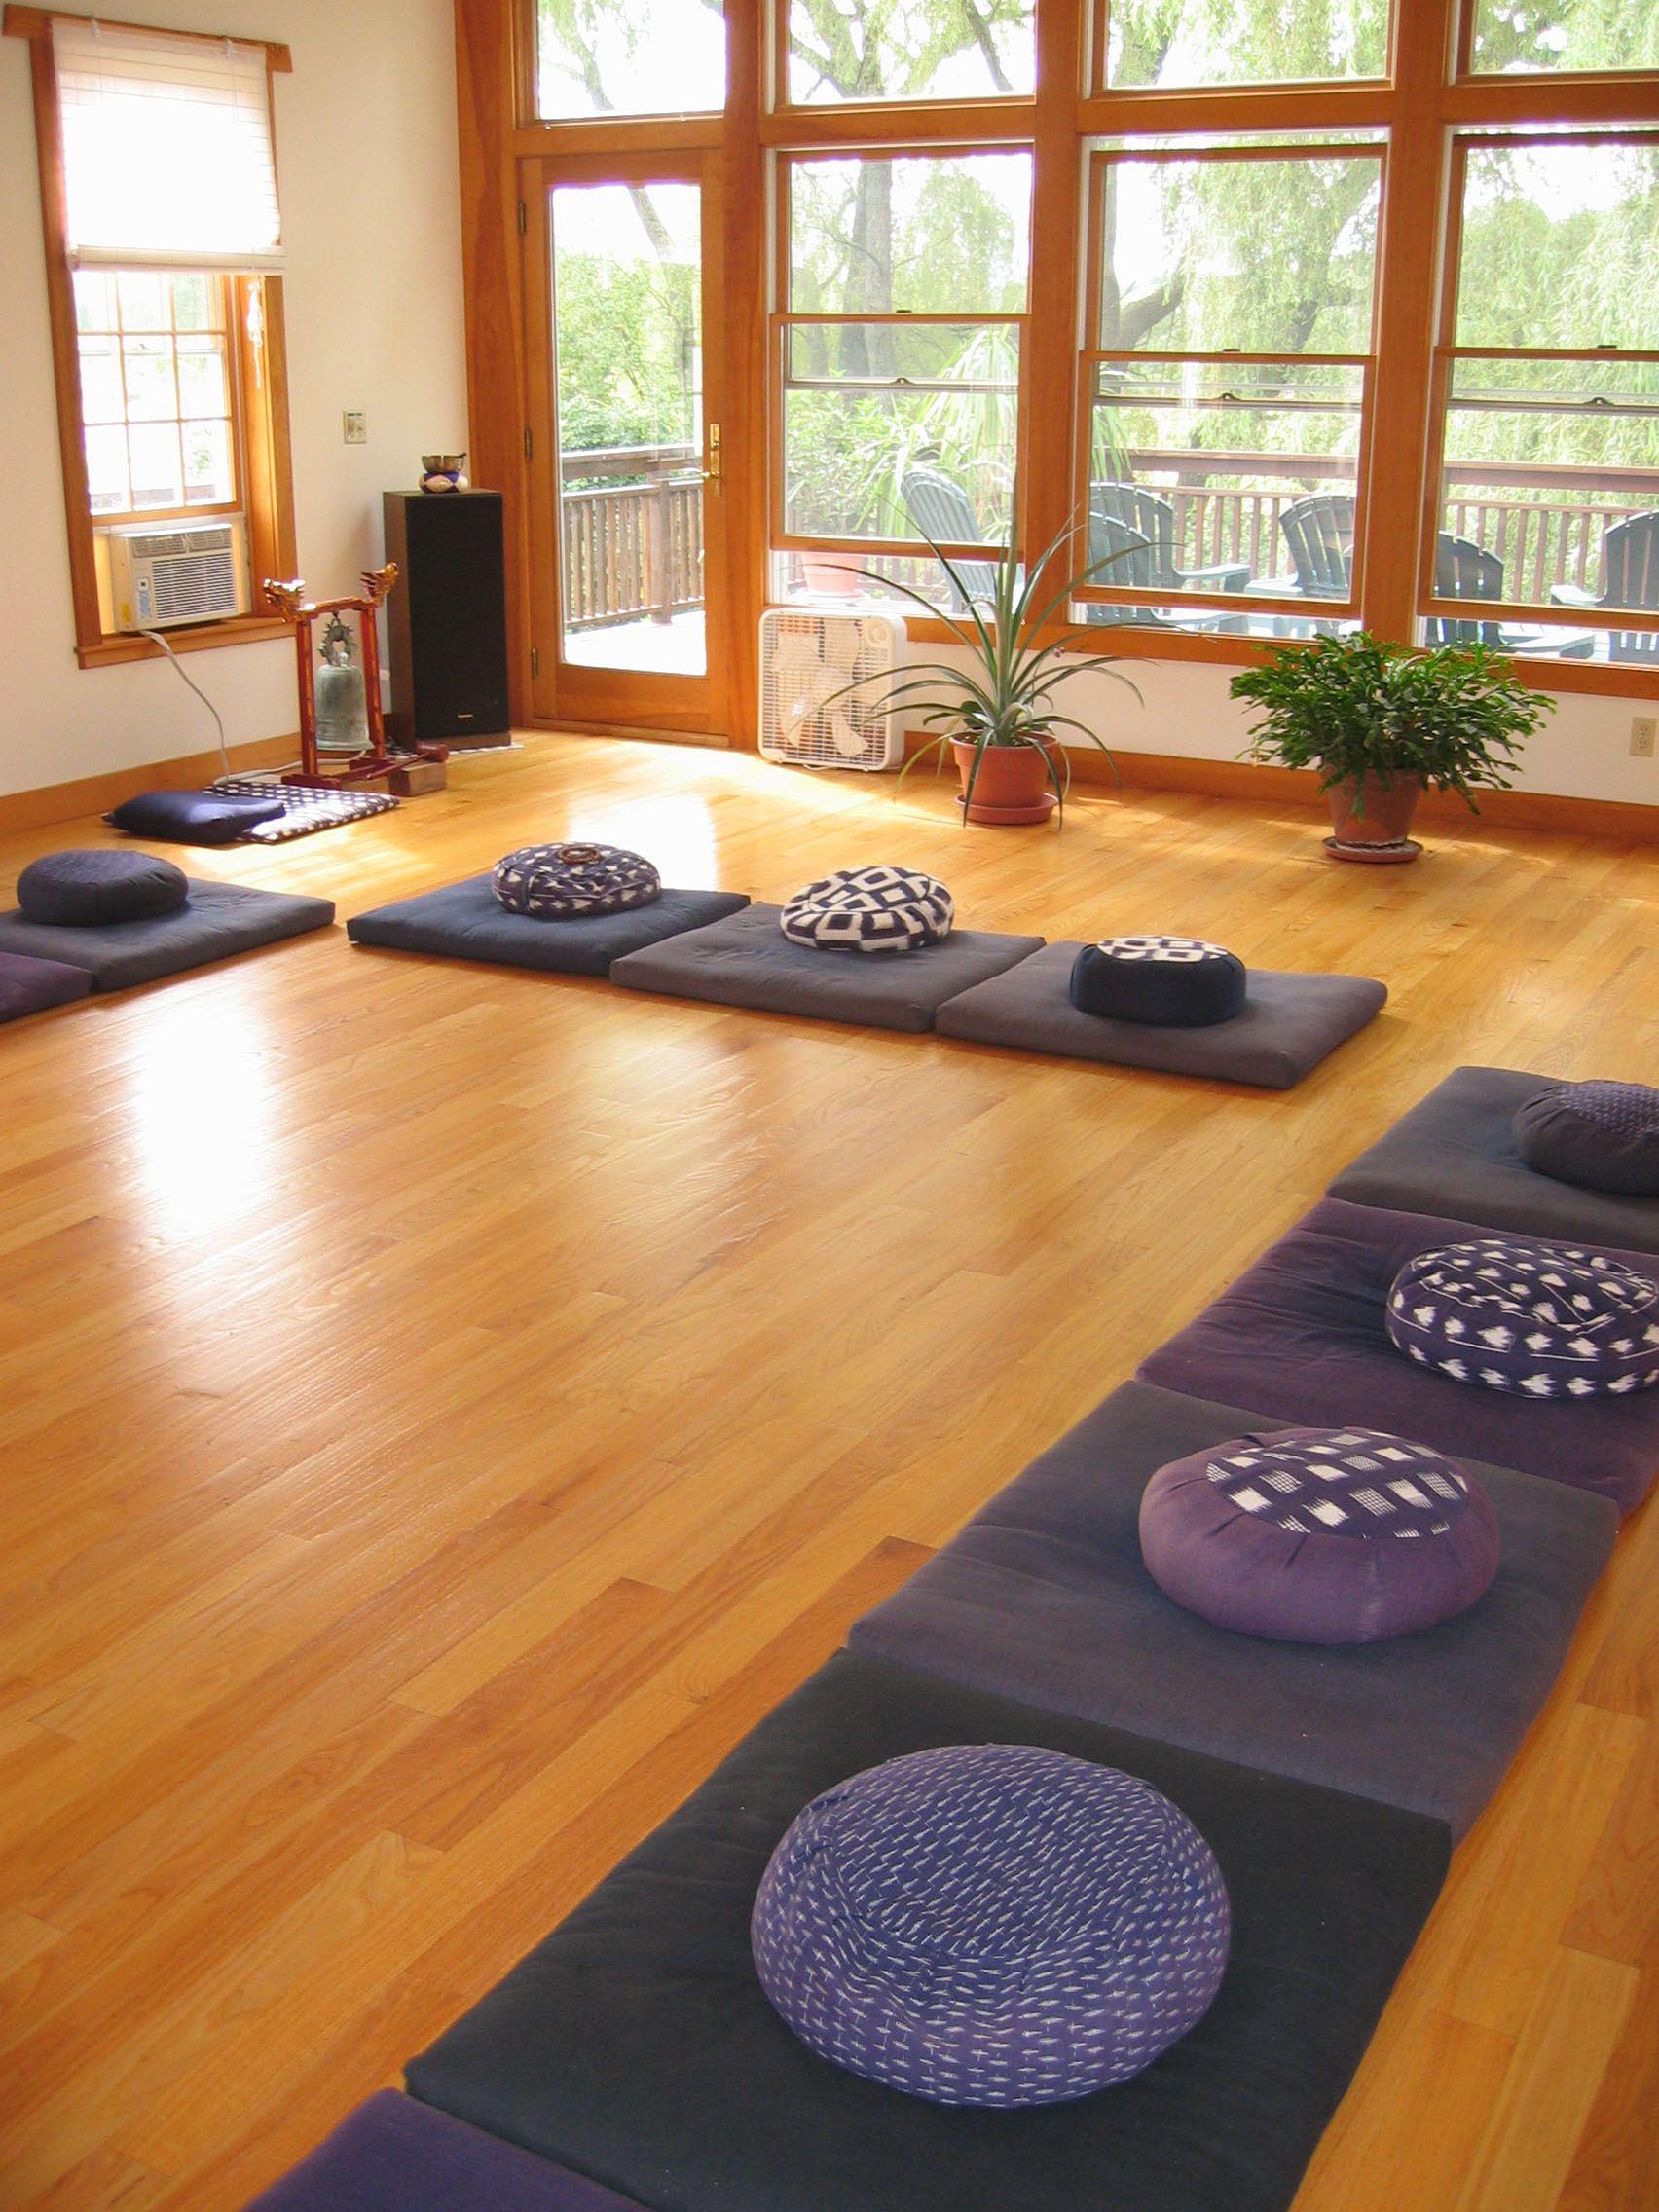 Meditation Room Yoga Meditation Room Meditation Rooms Meditation Room Design